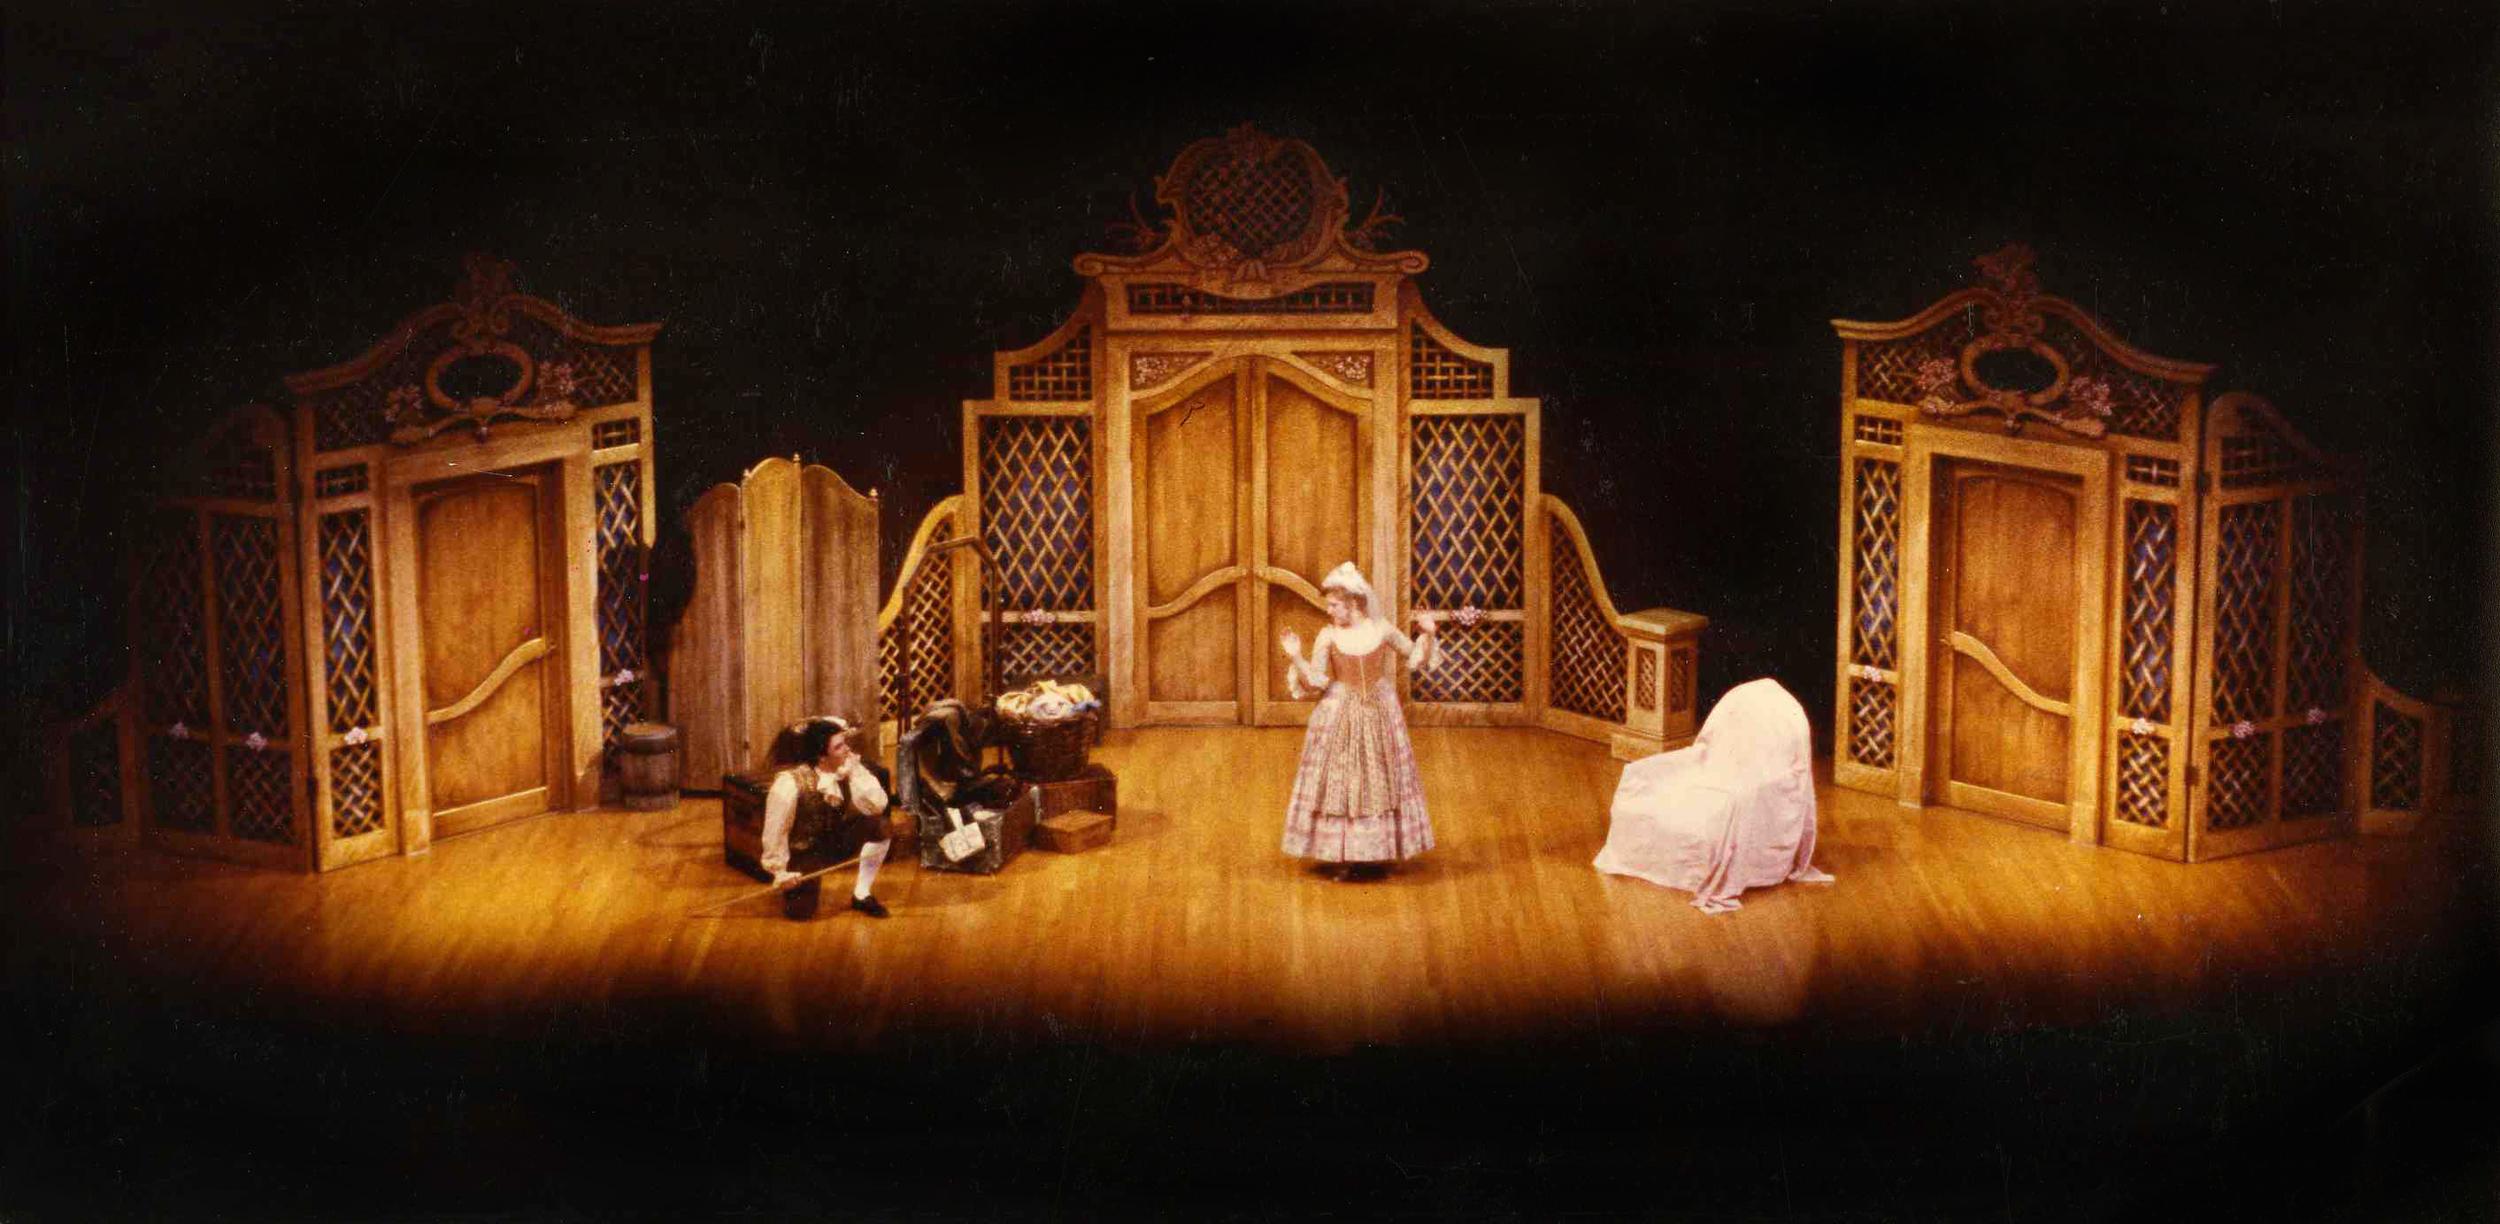 2.The Marriage of Figaro-Act I-Nicholas Music Center,NJ.jpg